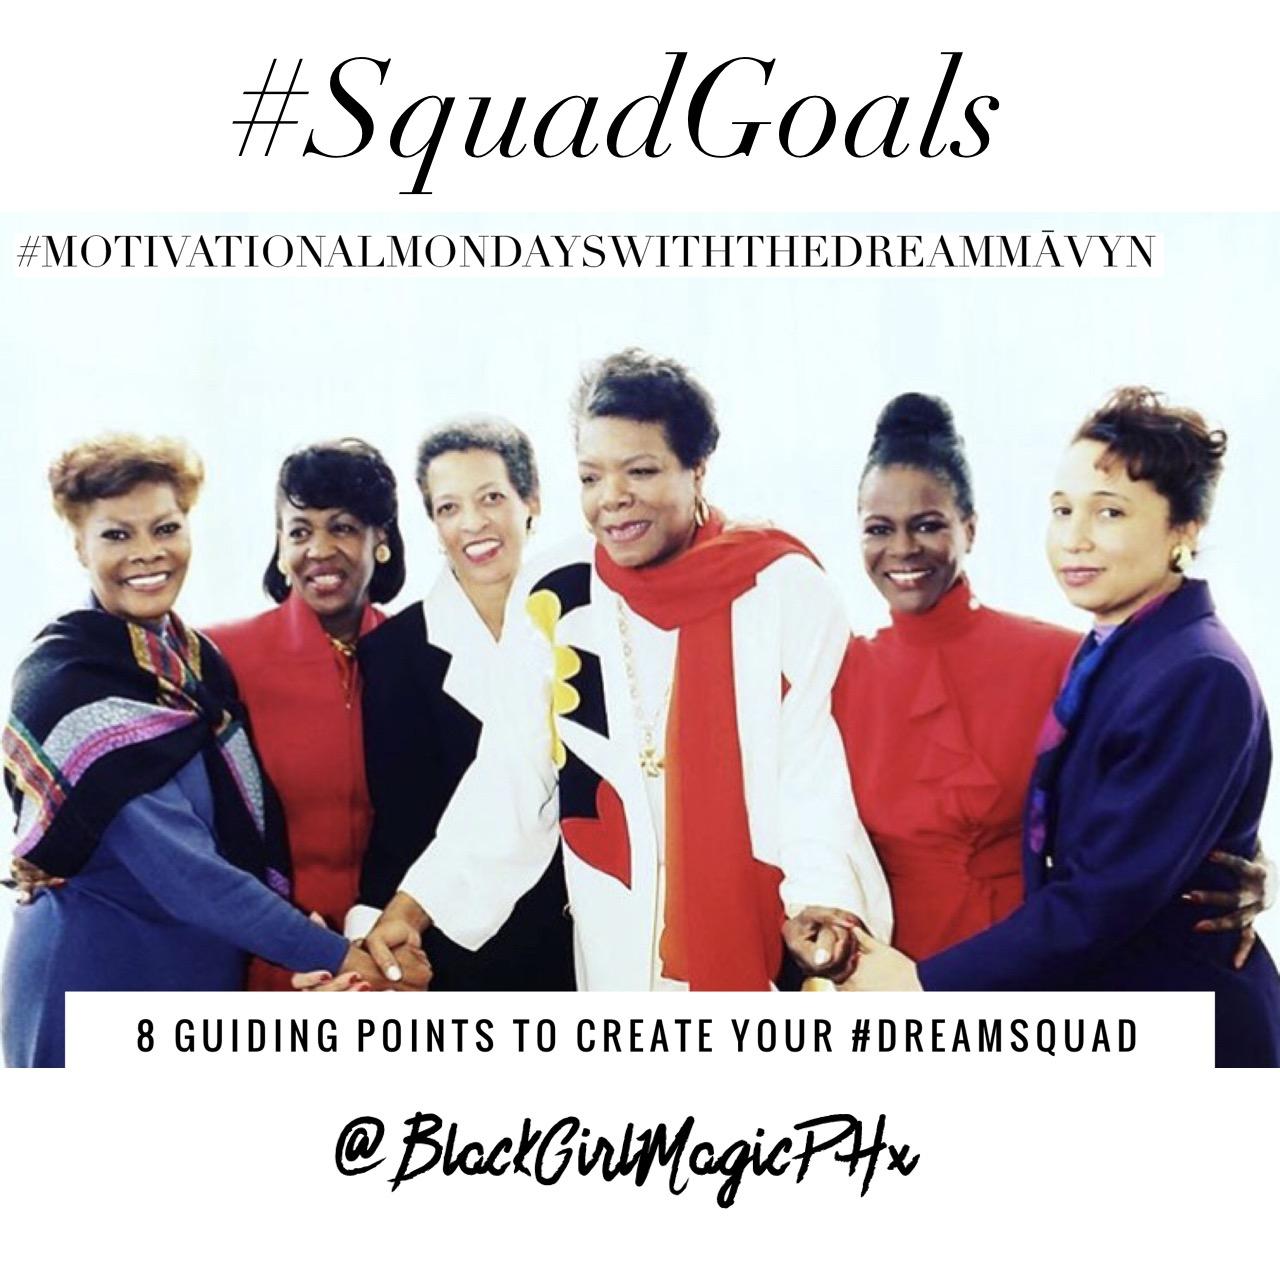 #motivationalmondayswiththedreammāvyn #blackgirlmagicphx #womenshistorymonth #blackwomen #squadgoals #dreamsquad #newseason #intuition #generousity #celebrateblackwomanhood #supportblackwomanhood #teamblackgirl